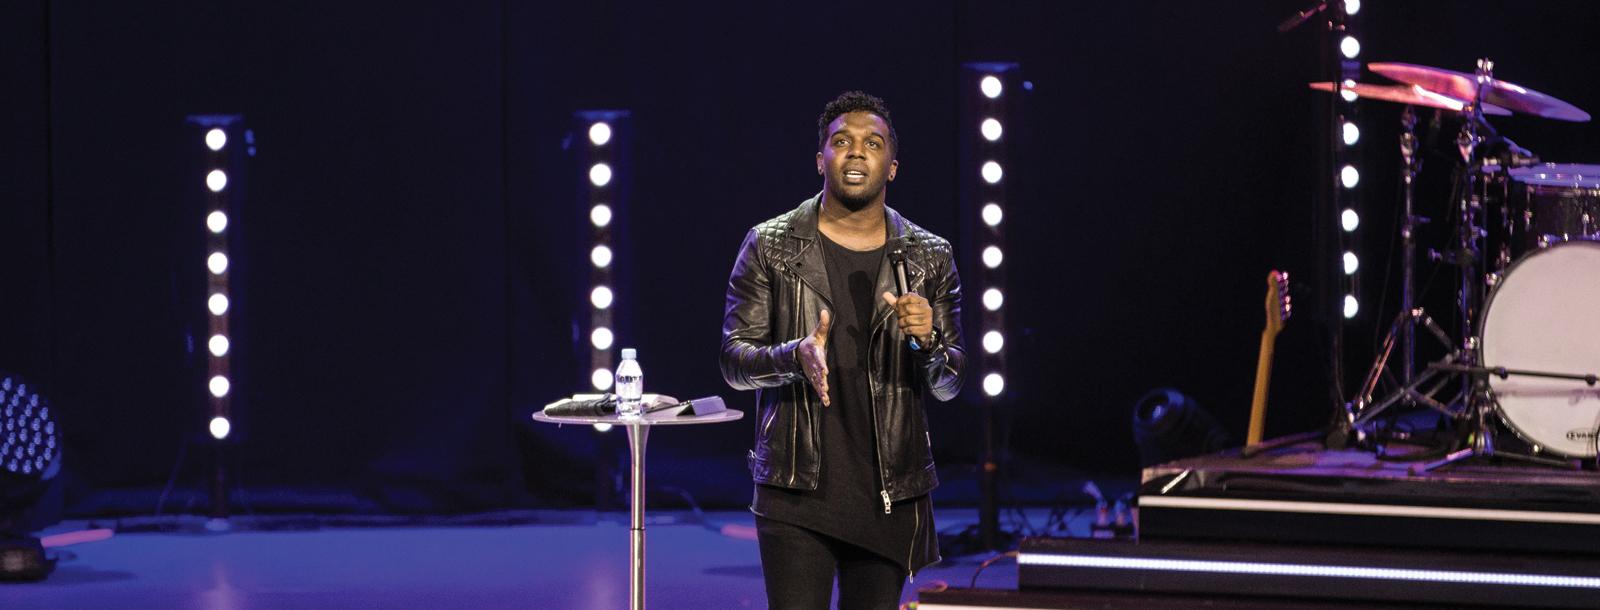 Dan Watson, Powerhouse Pastor  (18-25's)